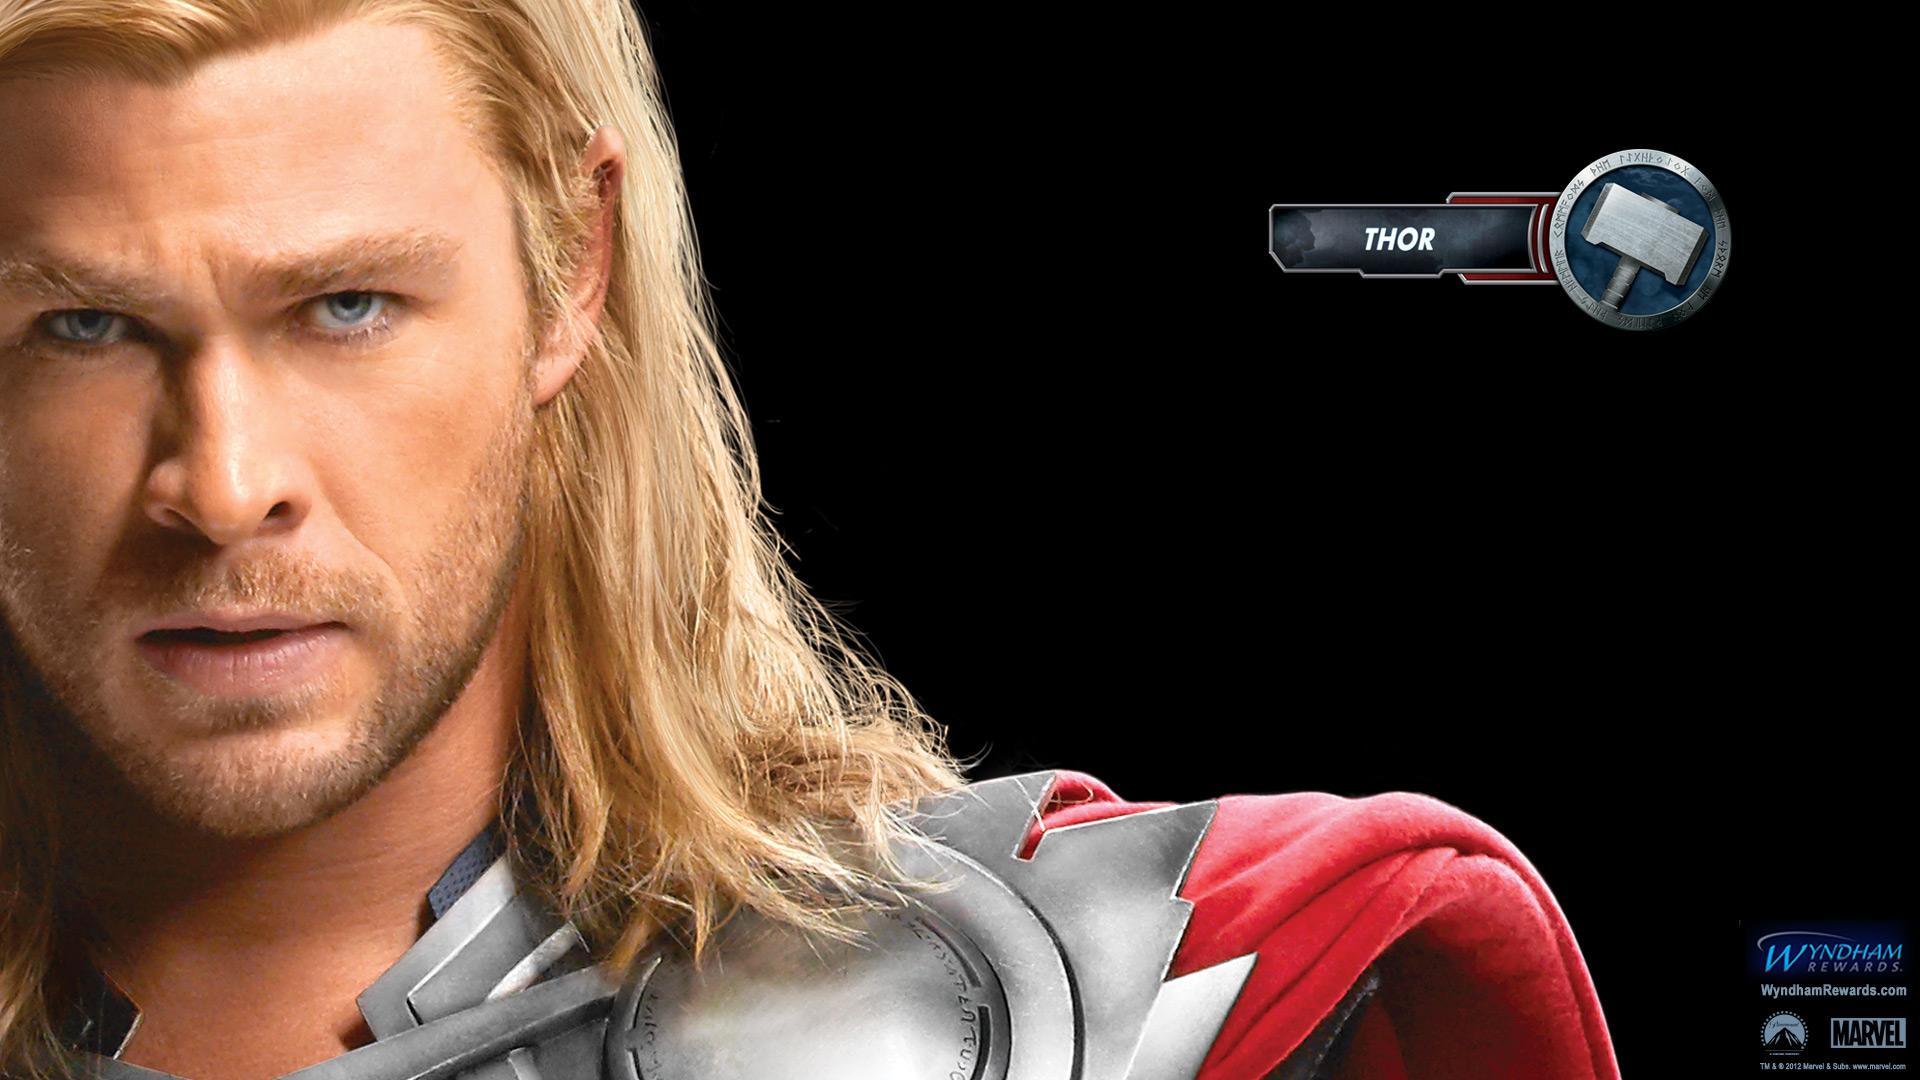 Thor - the-avengers Photo